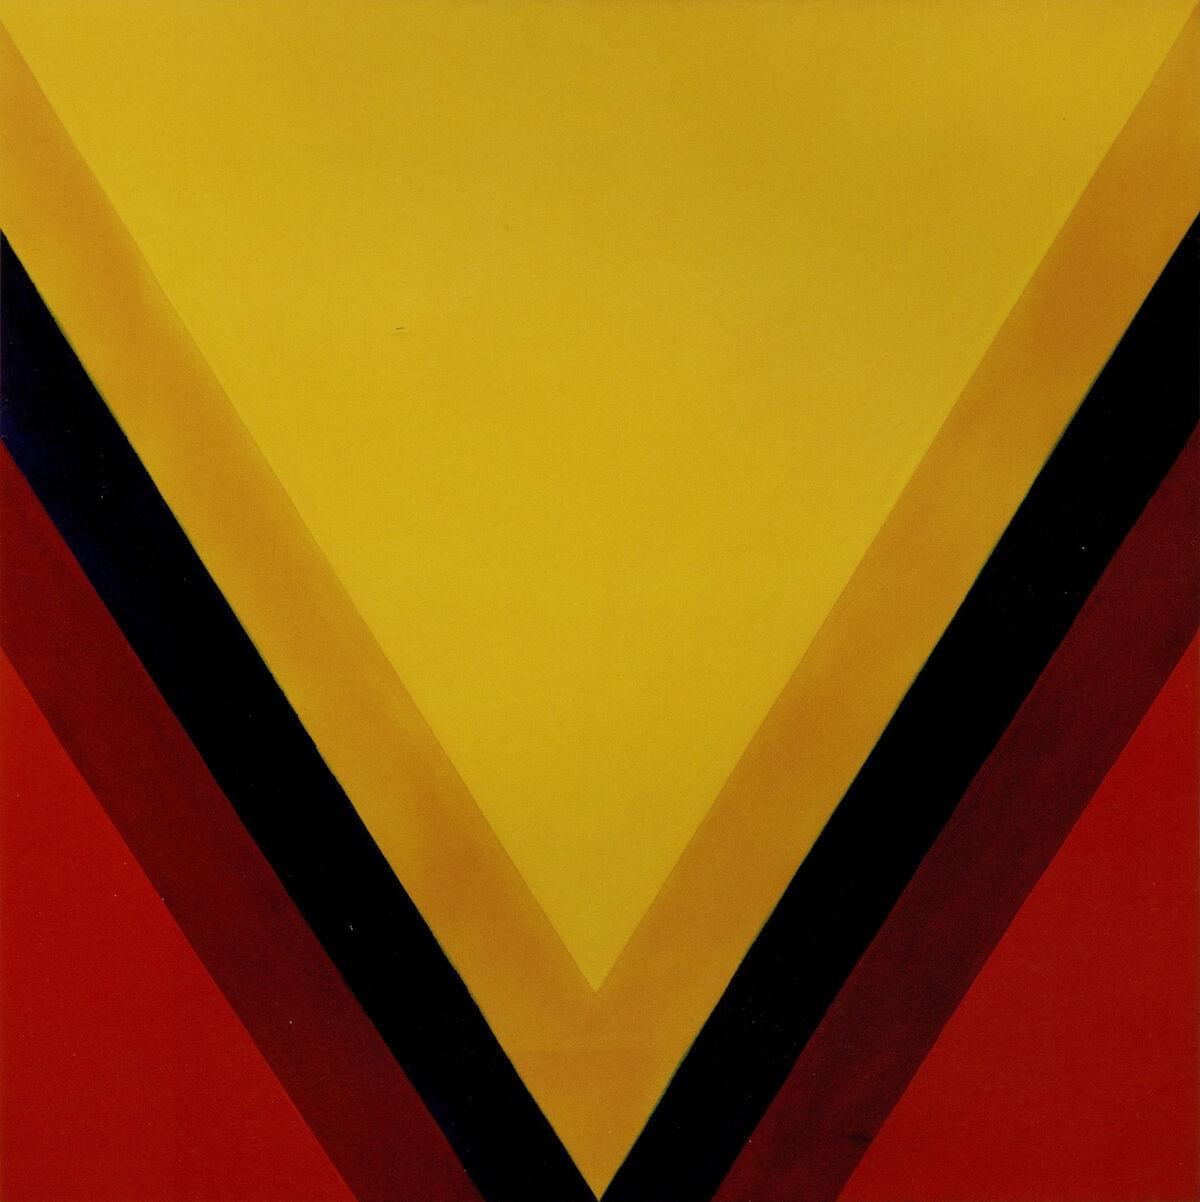 Kenneth Noland, East-West, 1963, magna on canvas. Est. $1 million–$1.5 million. Courtesy Sotheby's.